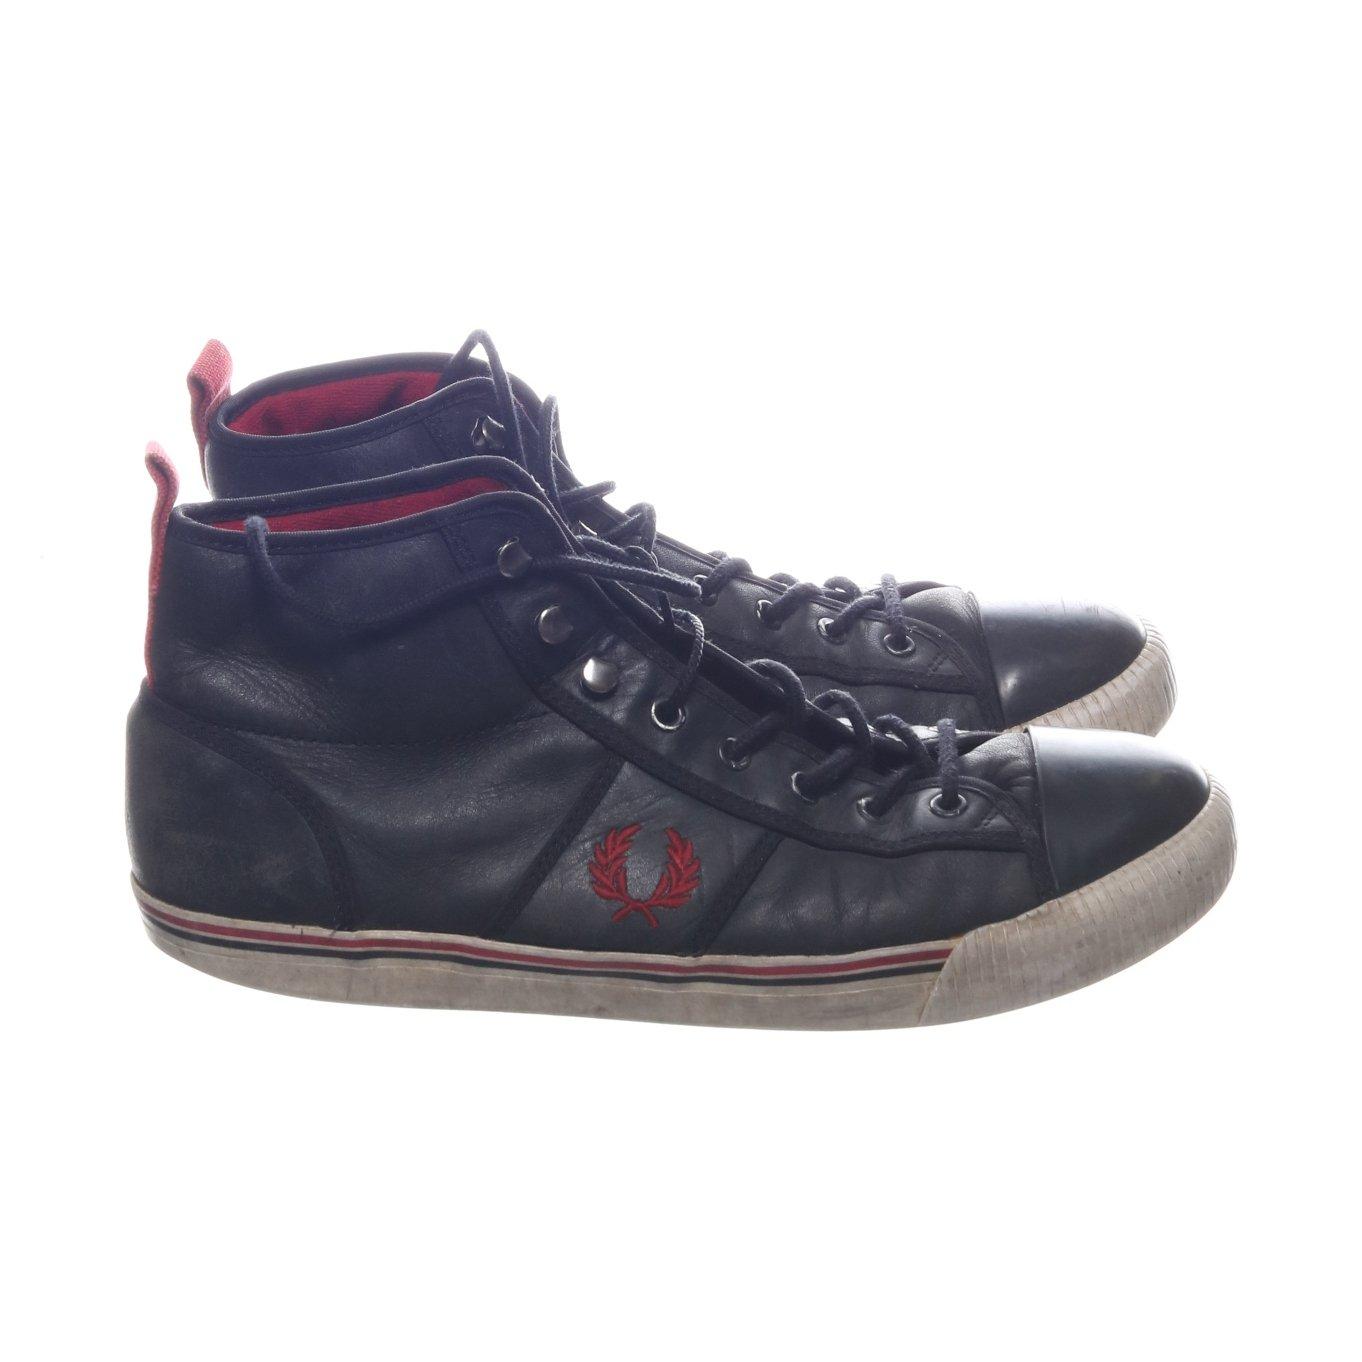 10bc4d4e8986 Fred Perry, Sneakers, Strl: 45, Svart, Skinn (354808500) ᐈ Sellpy ...